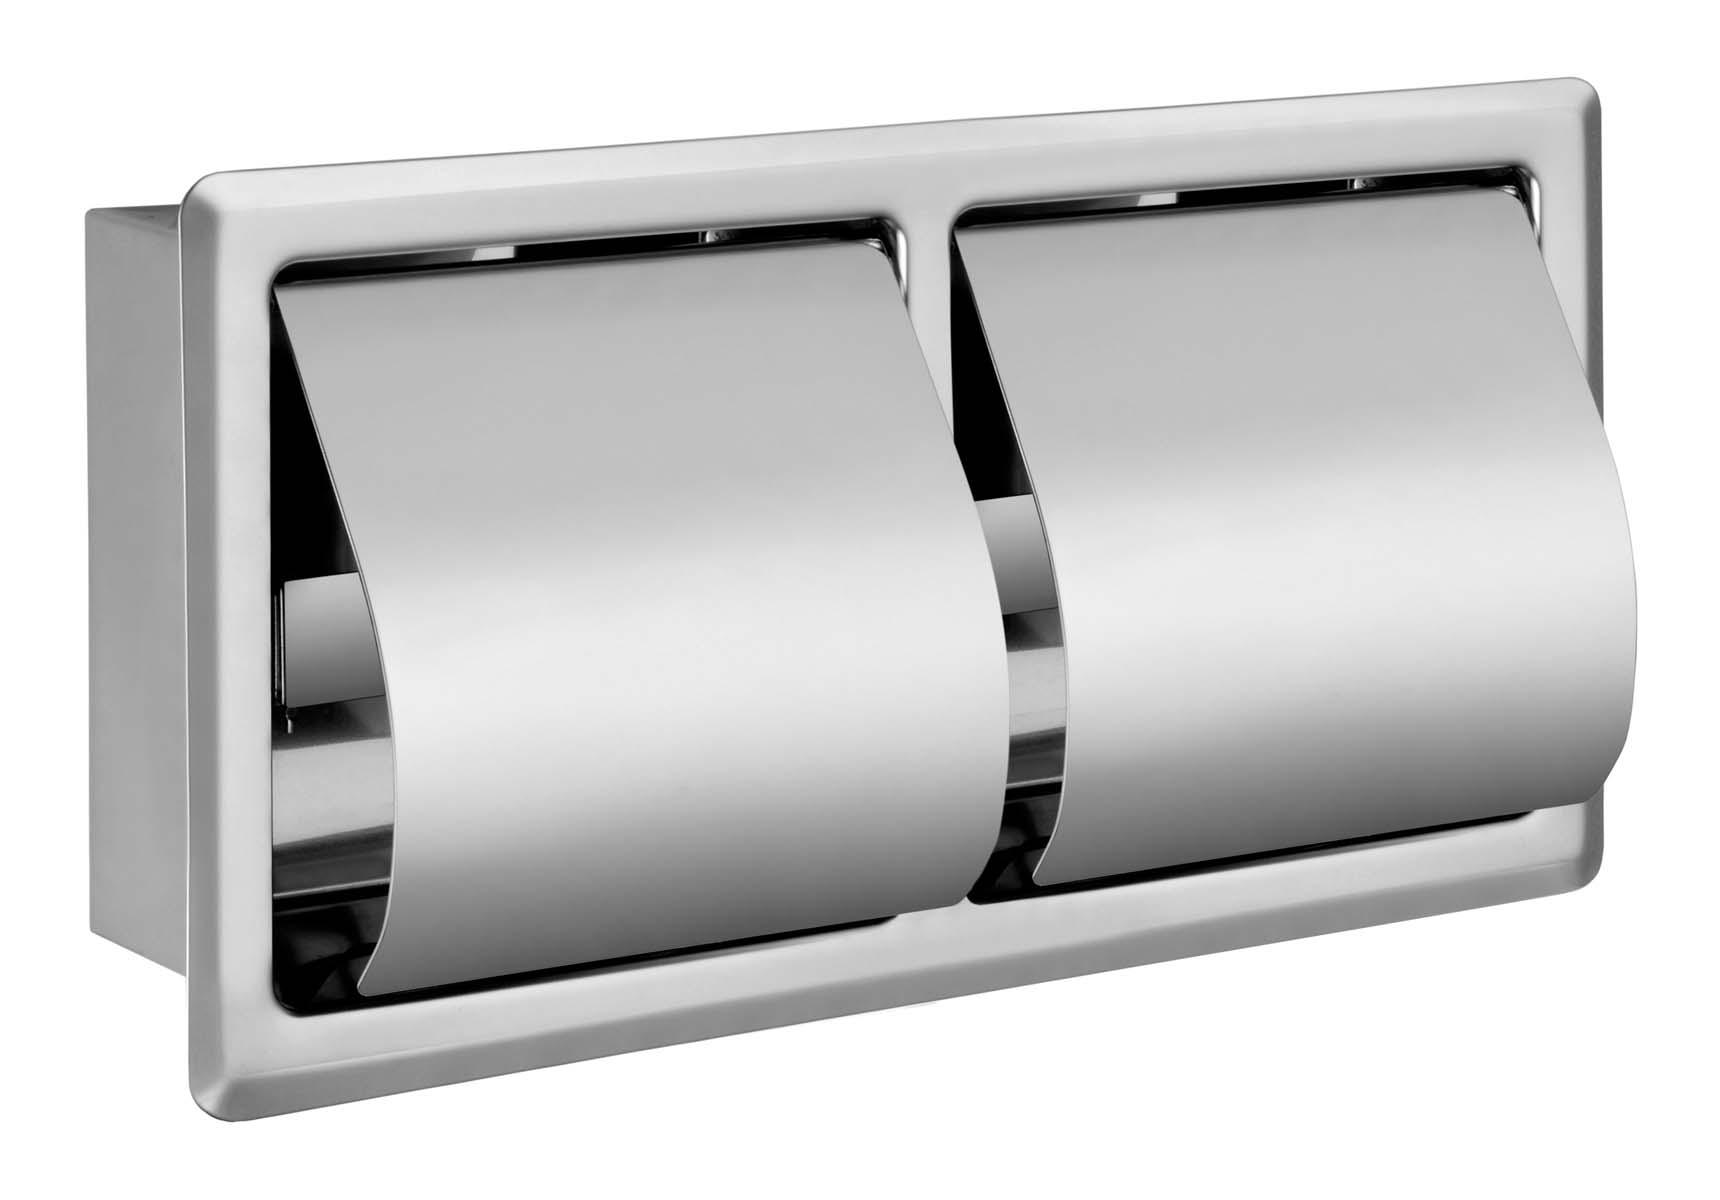 Arkitekta Built-in Roll Holder (Double Horizontal)